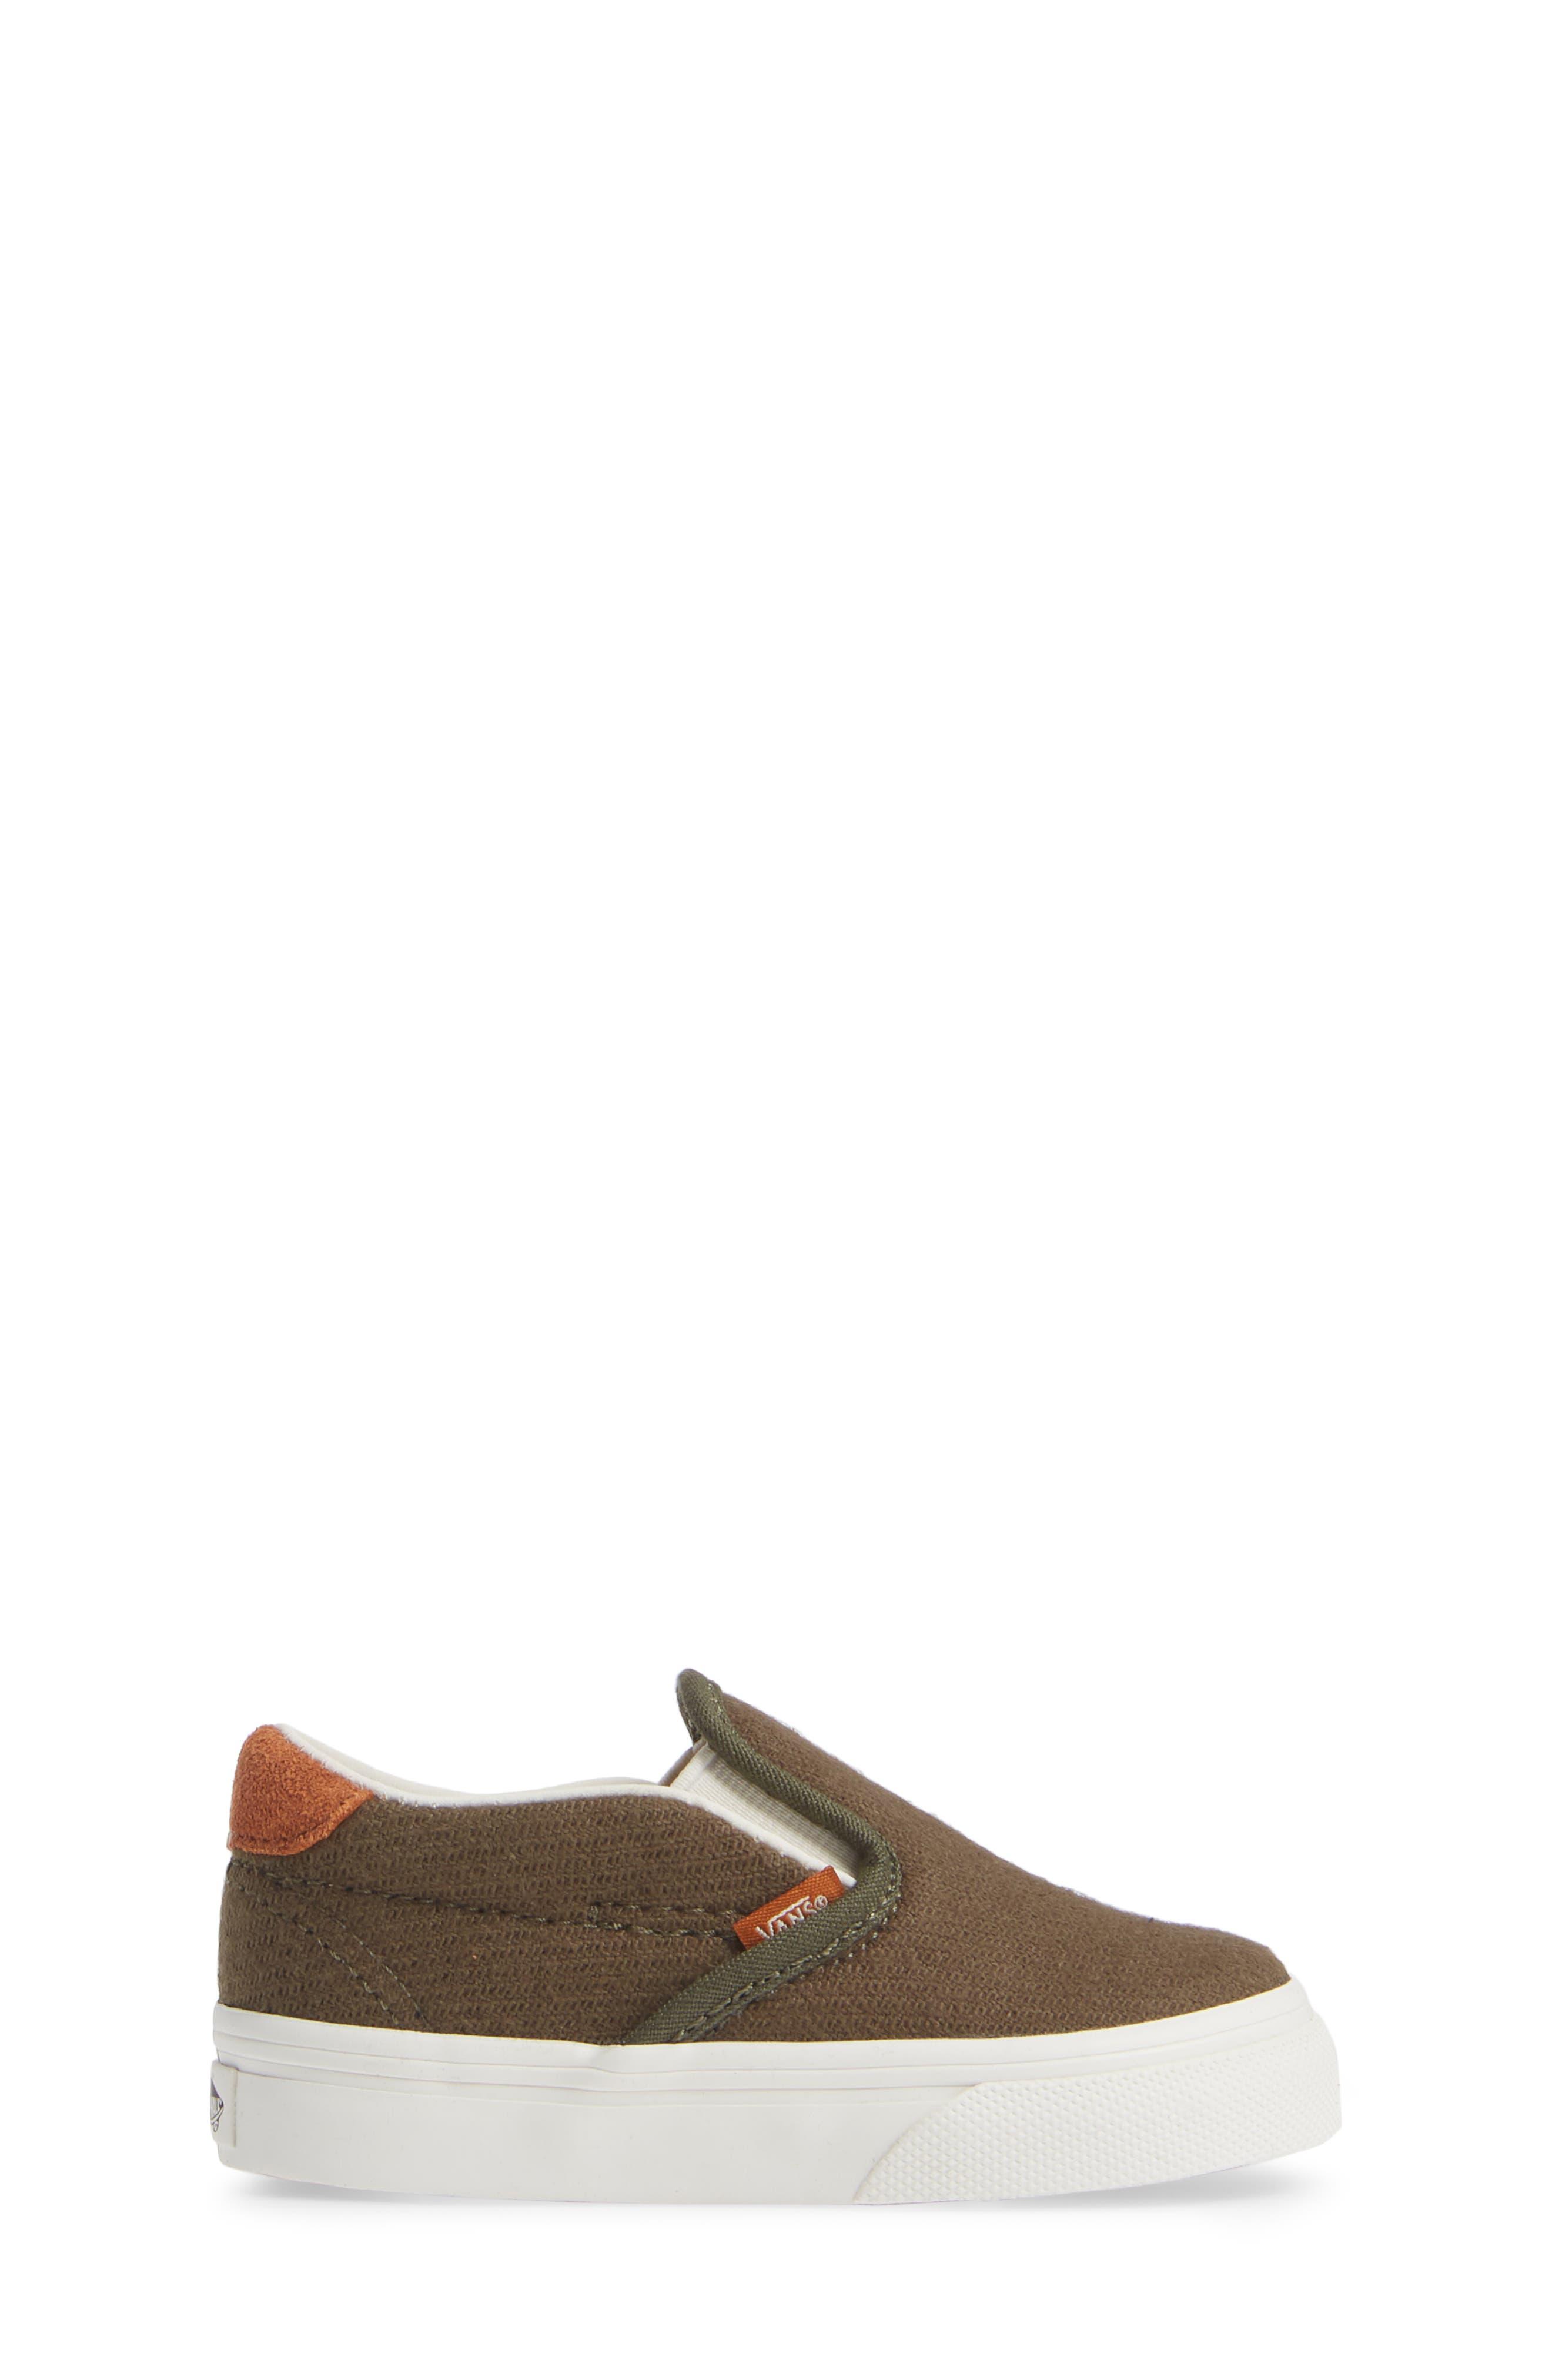 59 Slip-On Sneaker,                             Alternate thumbnail 3, color,                             FLANNEL DUSTY OLIVE